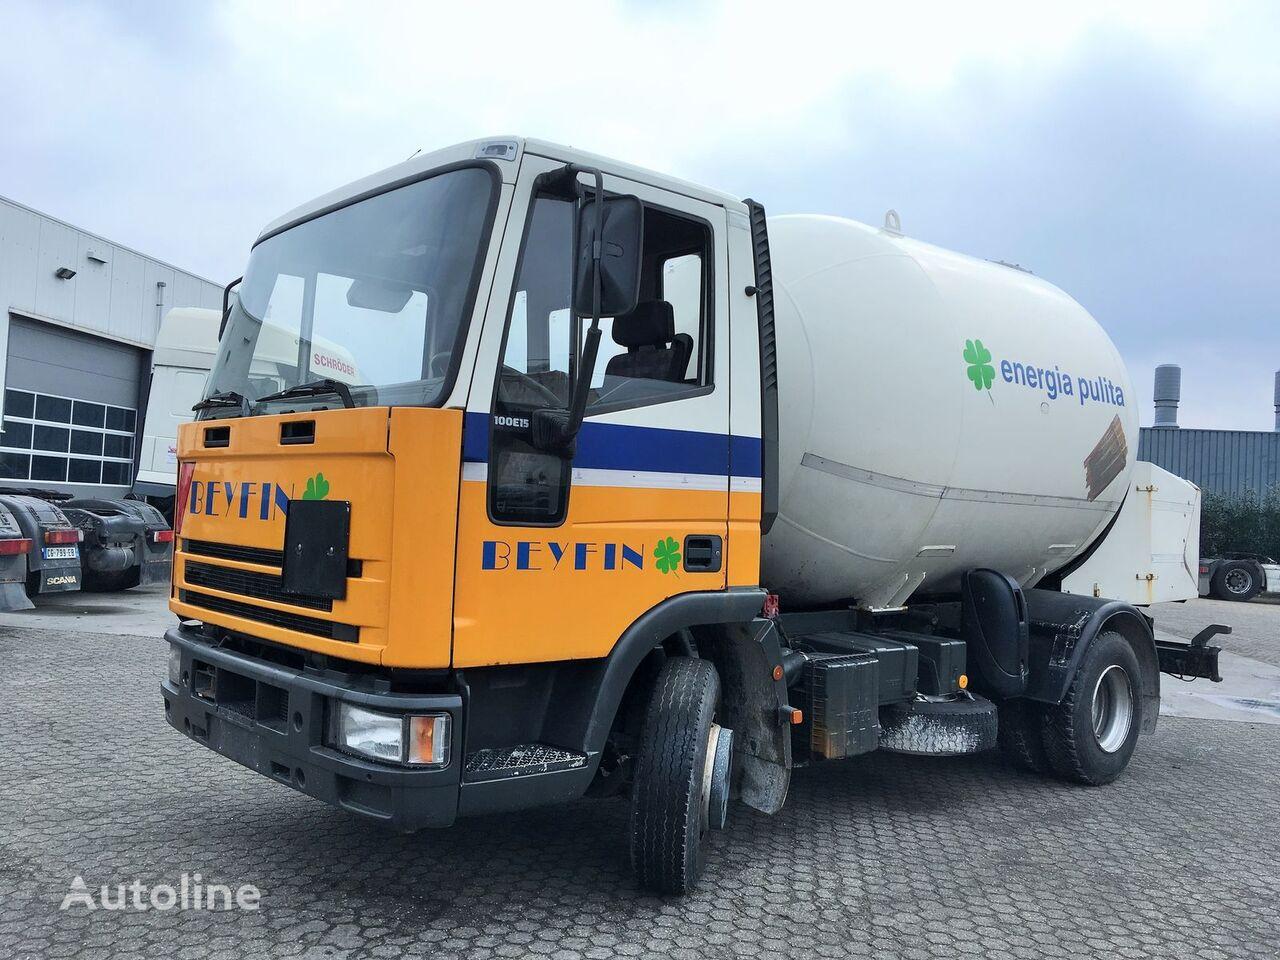 IVECO Iveco Gas - Gaz - ADR 2 - 10.000ltr - 27Bar - P27BH gas tank truck